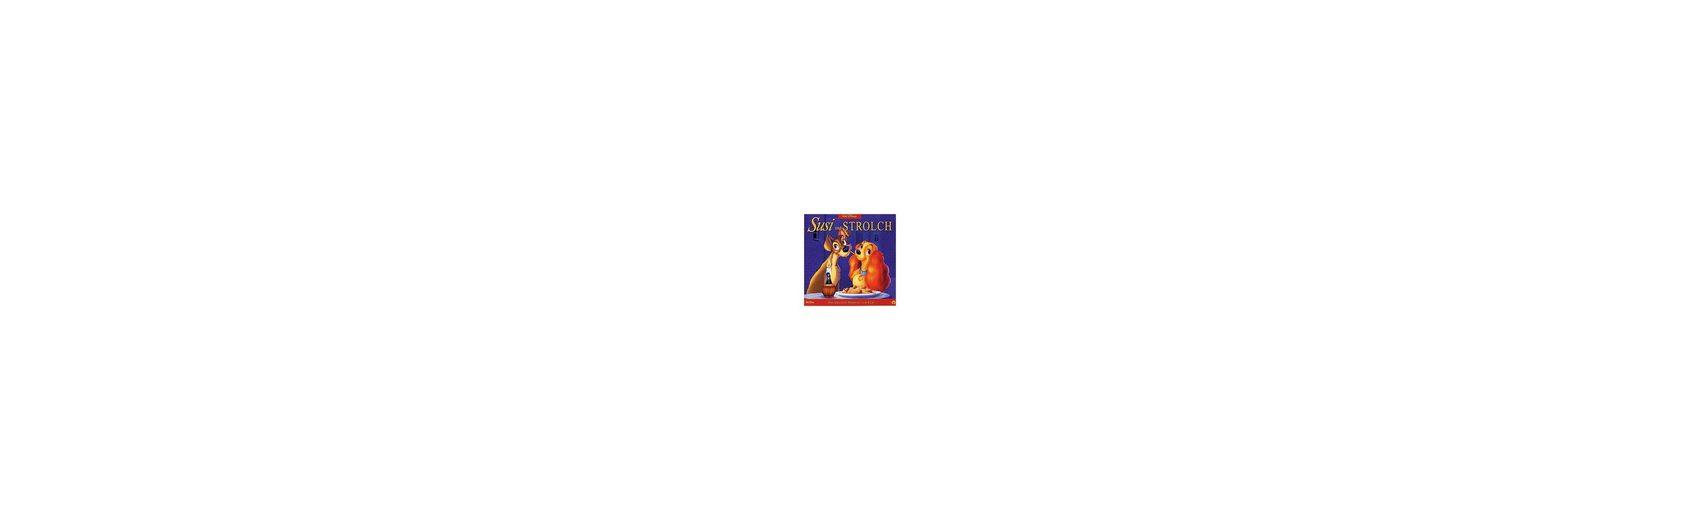 Kiddinx CD Walt Disney Susi & Strolch